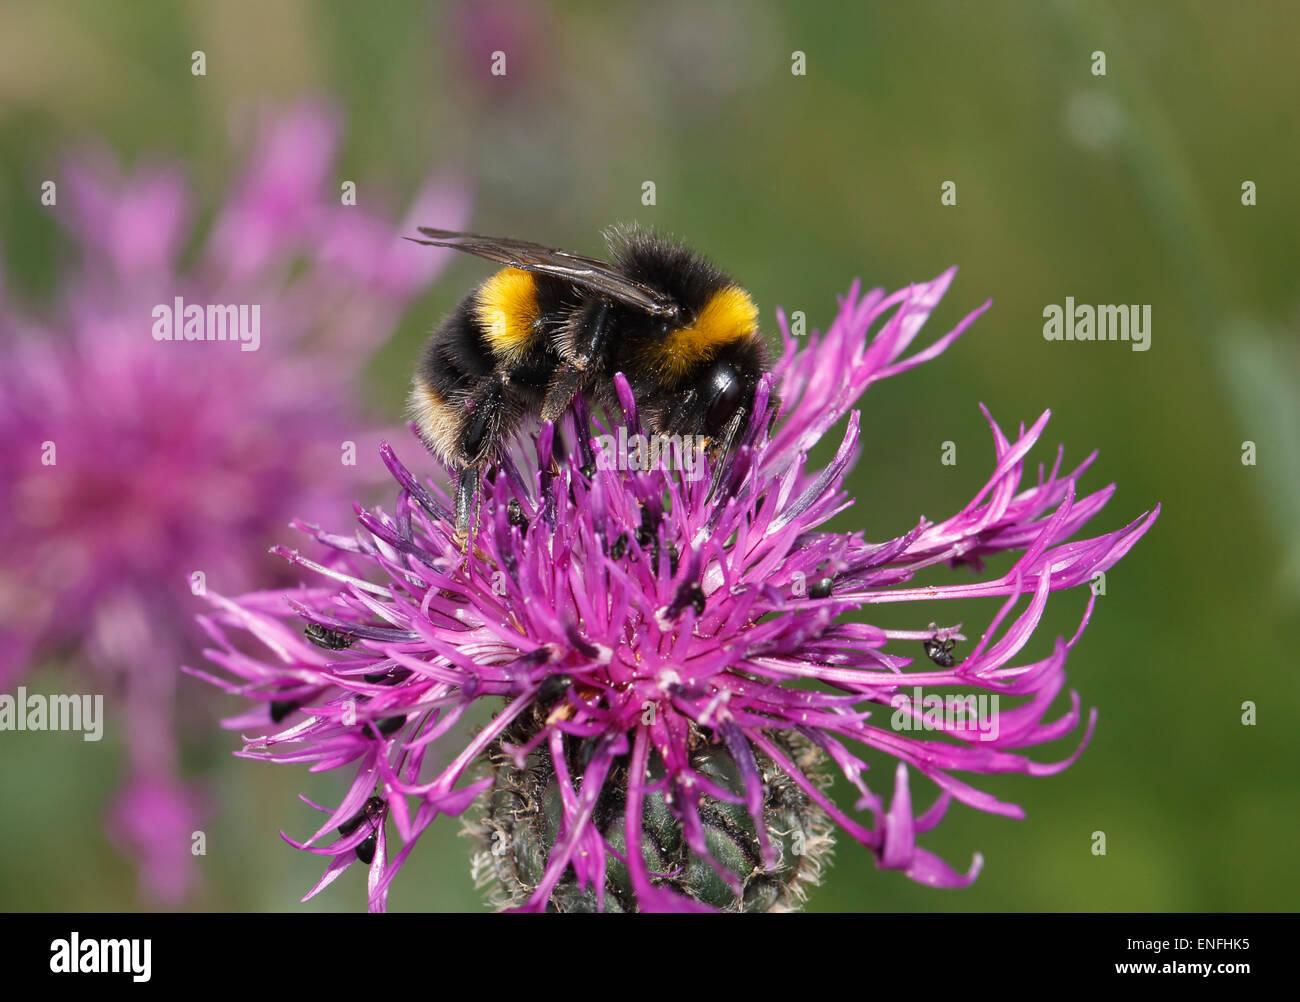 Cuckoo Bumblebee - Bombus sylvestris - Stock Image